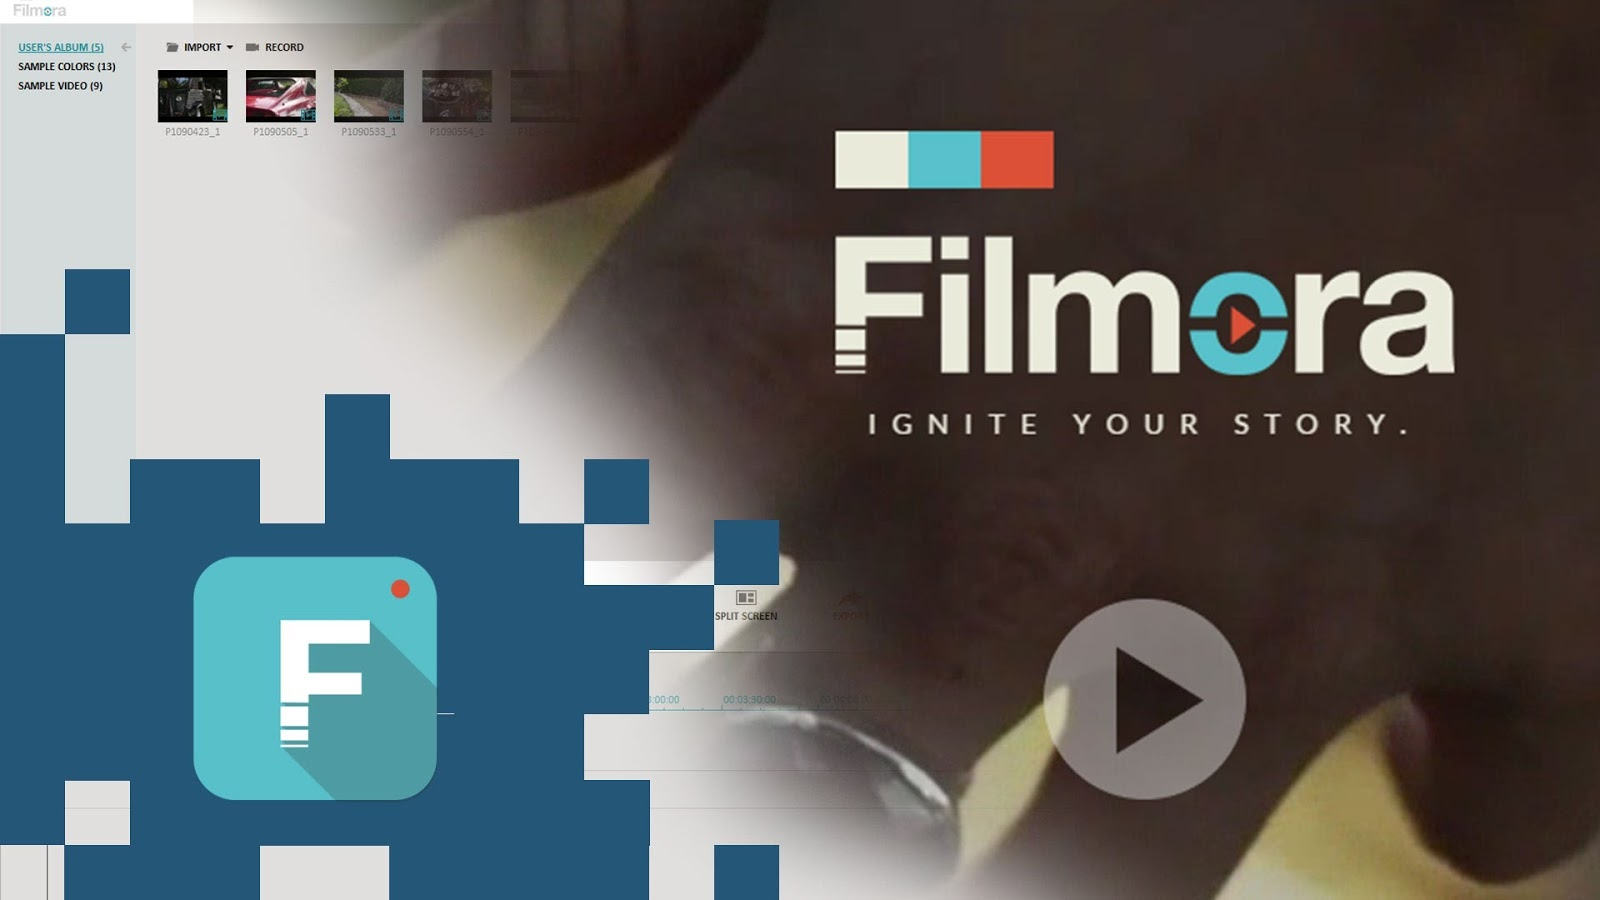 wondershare filmora video editor 7.8.9 crack